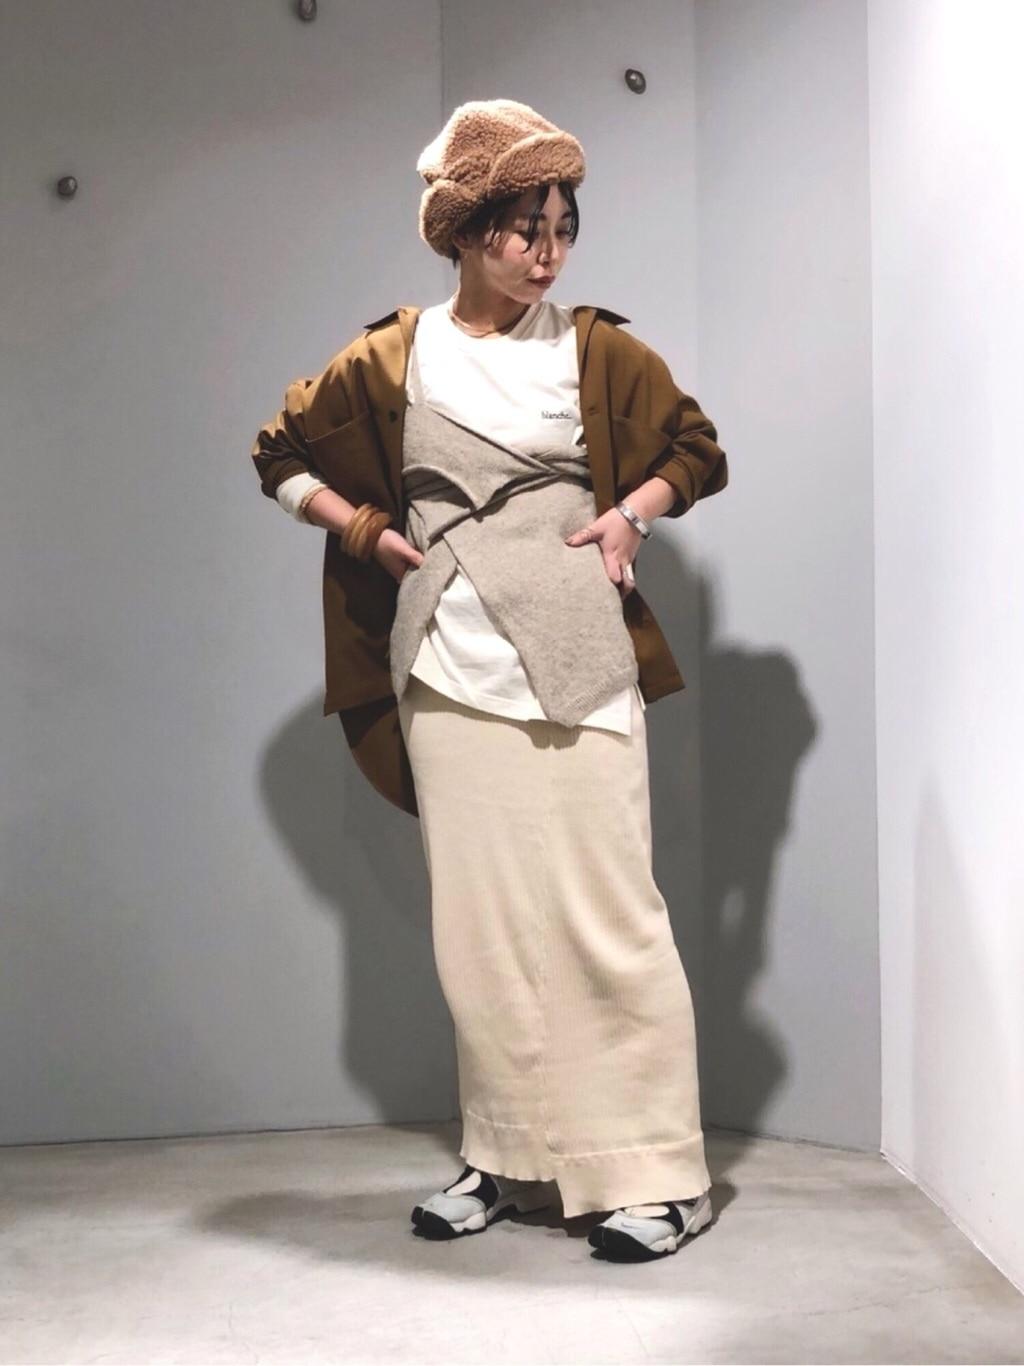 caph troupe 代々木上原路面 身長:160cm 2019.12.06